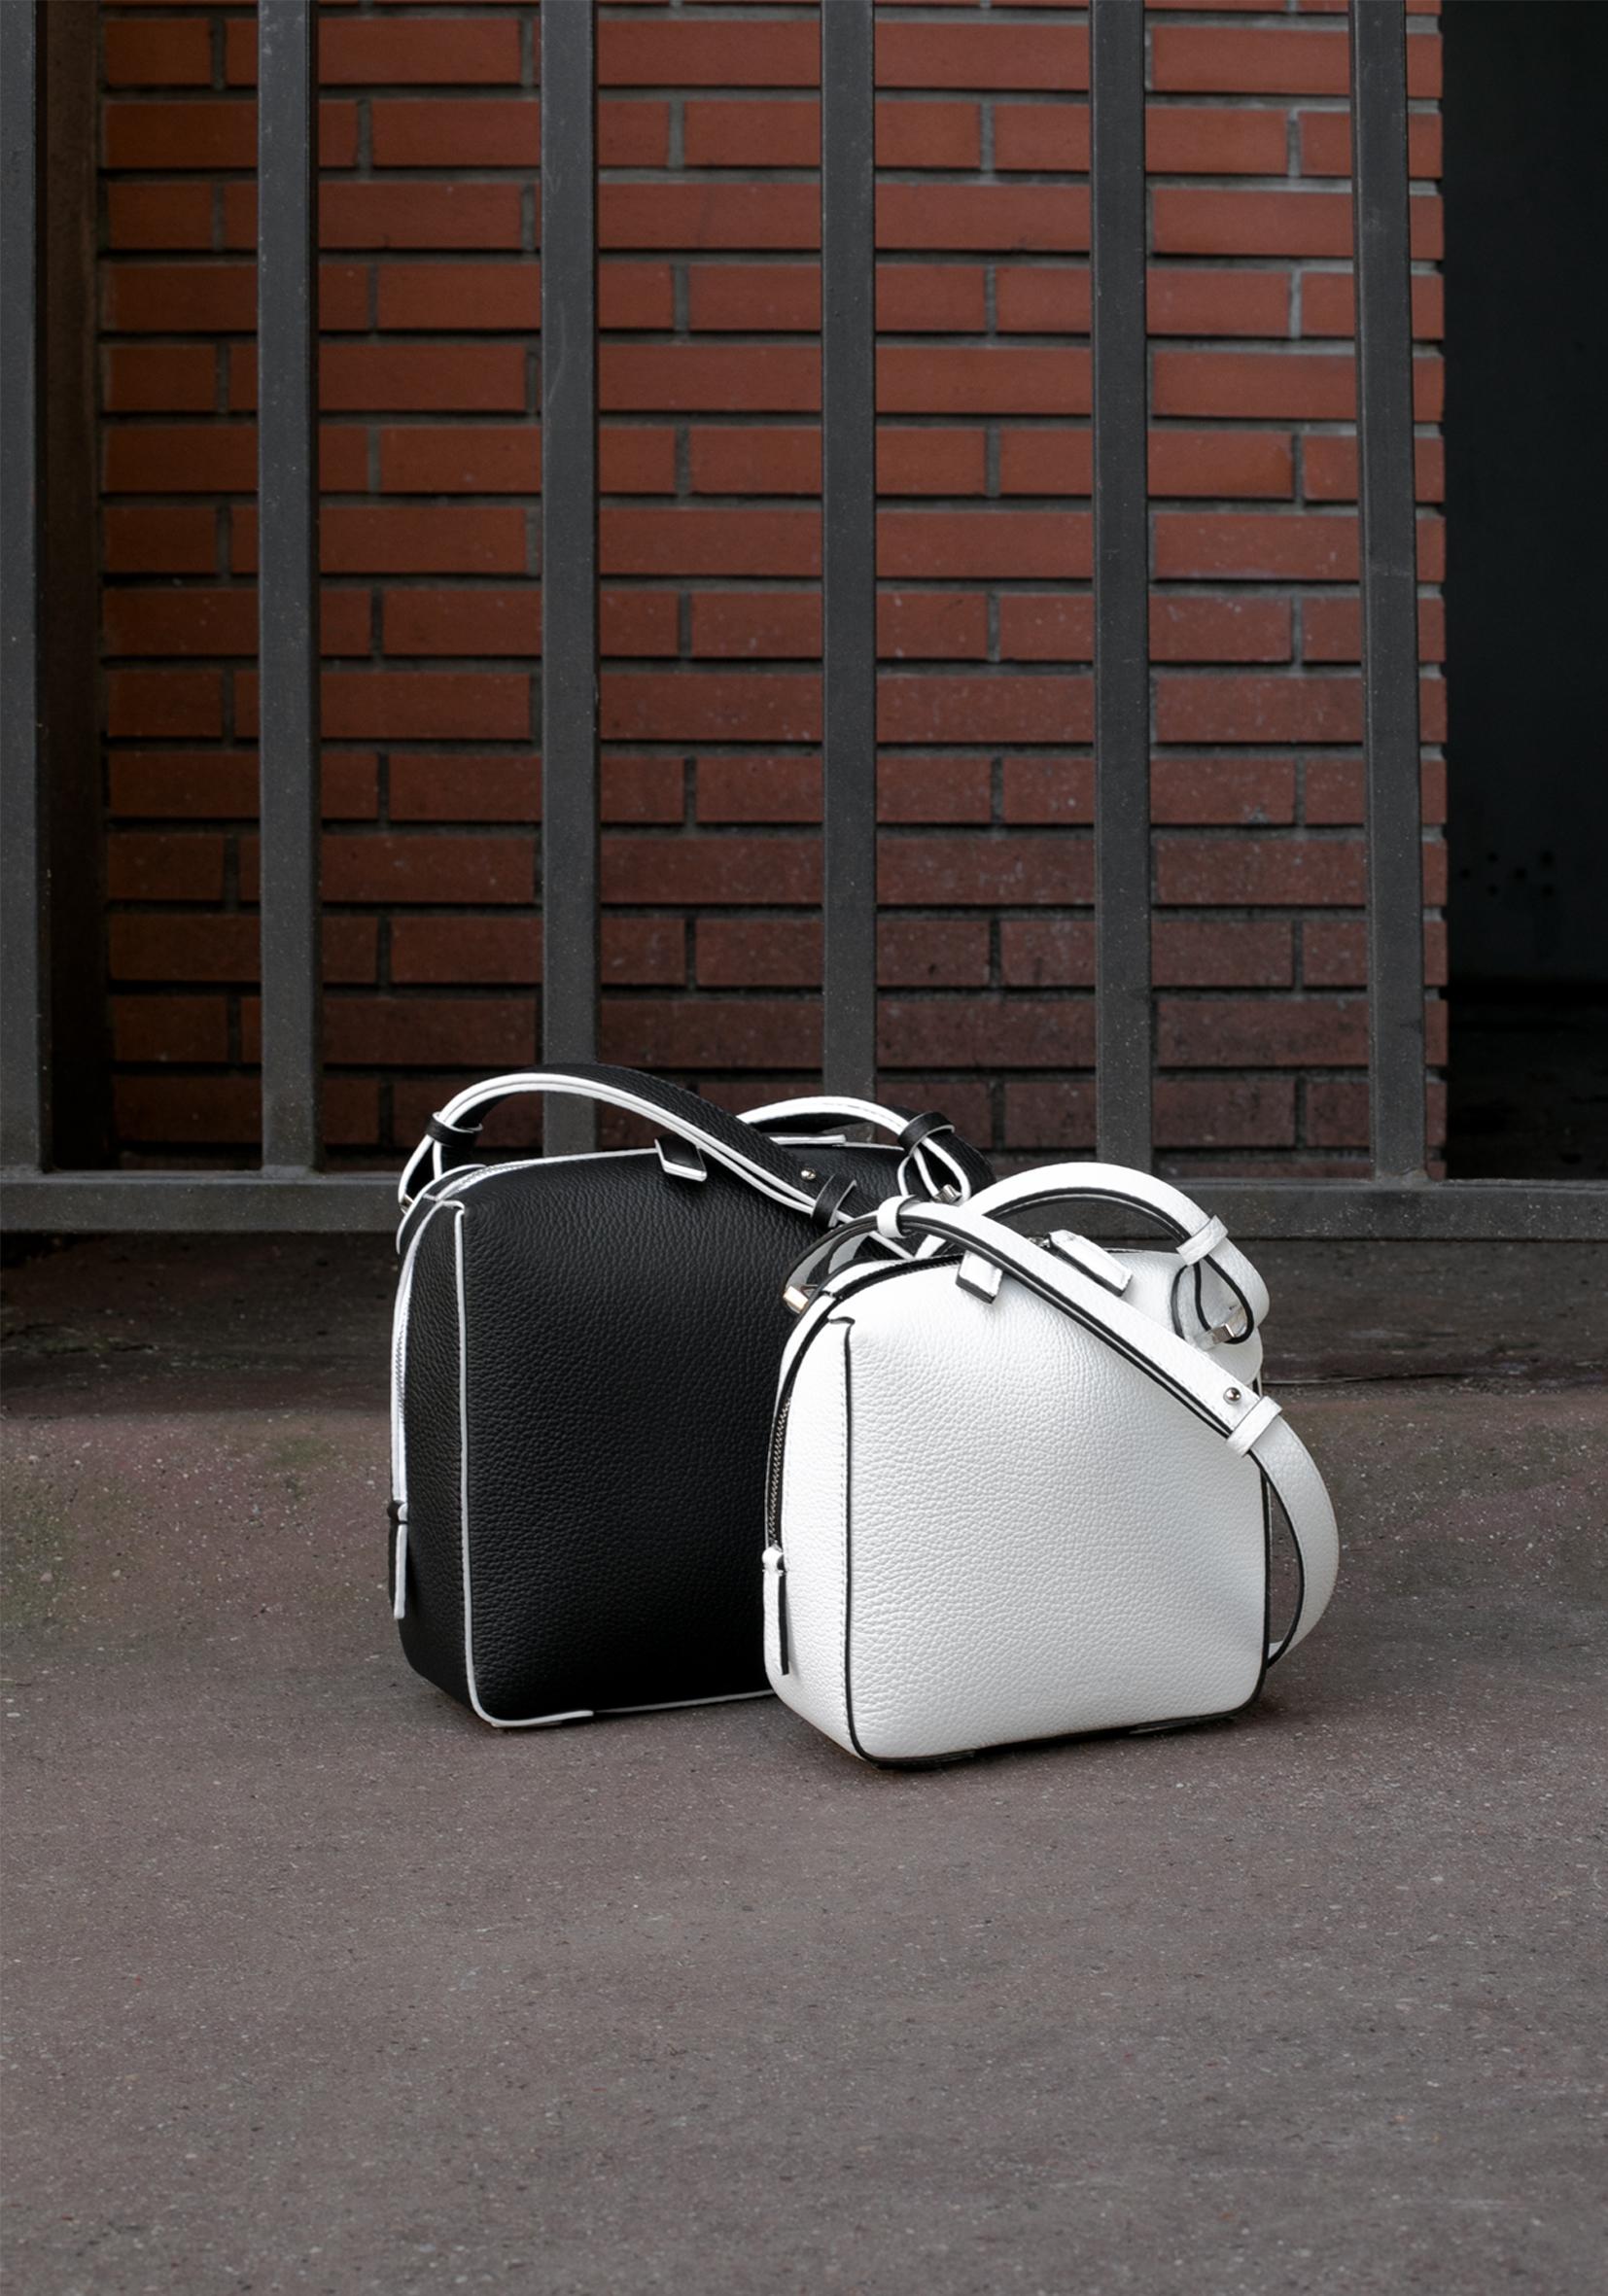 BAURAIN FW18 one crossbody medium and small bags